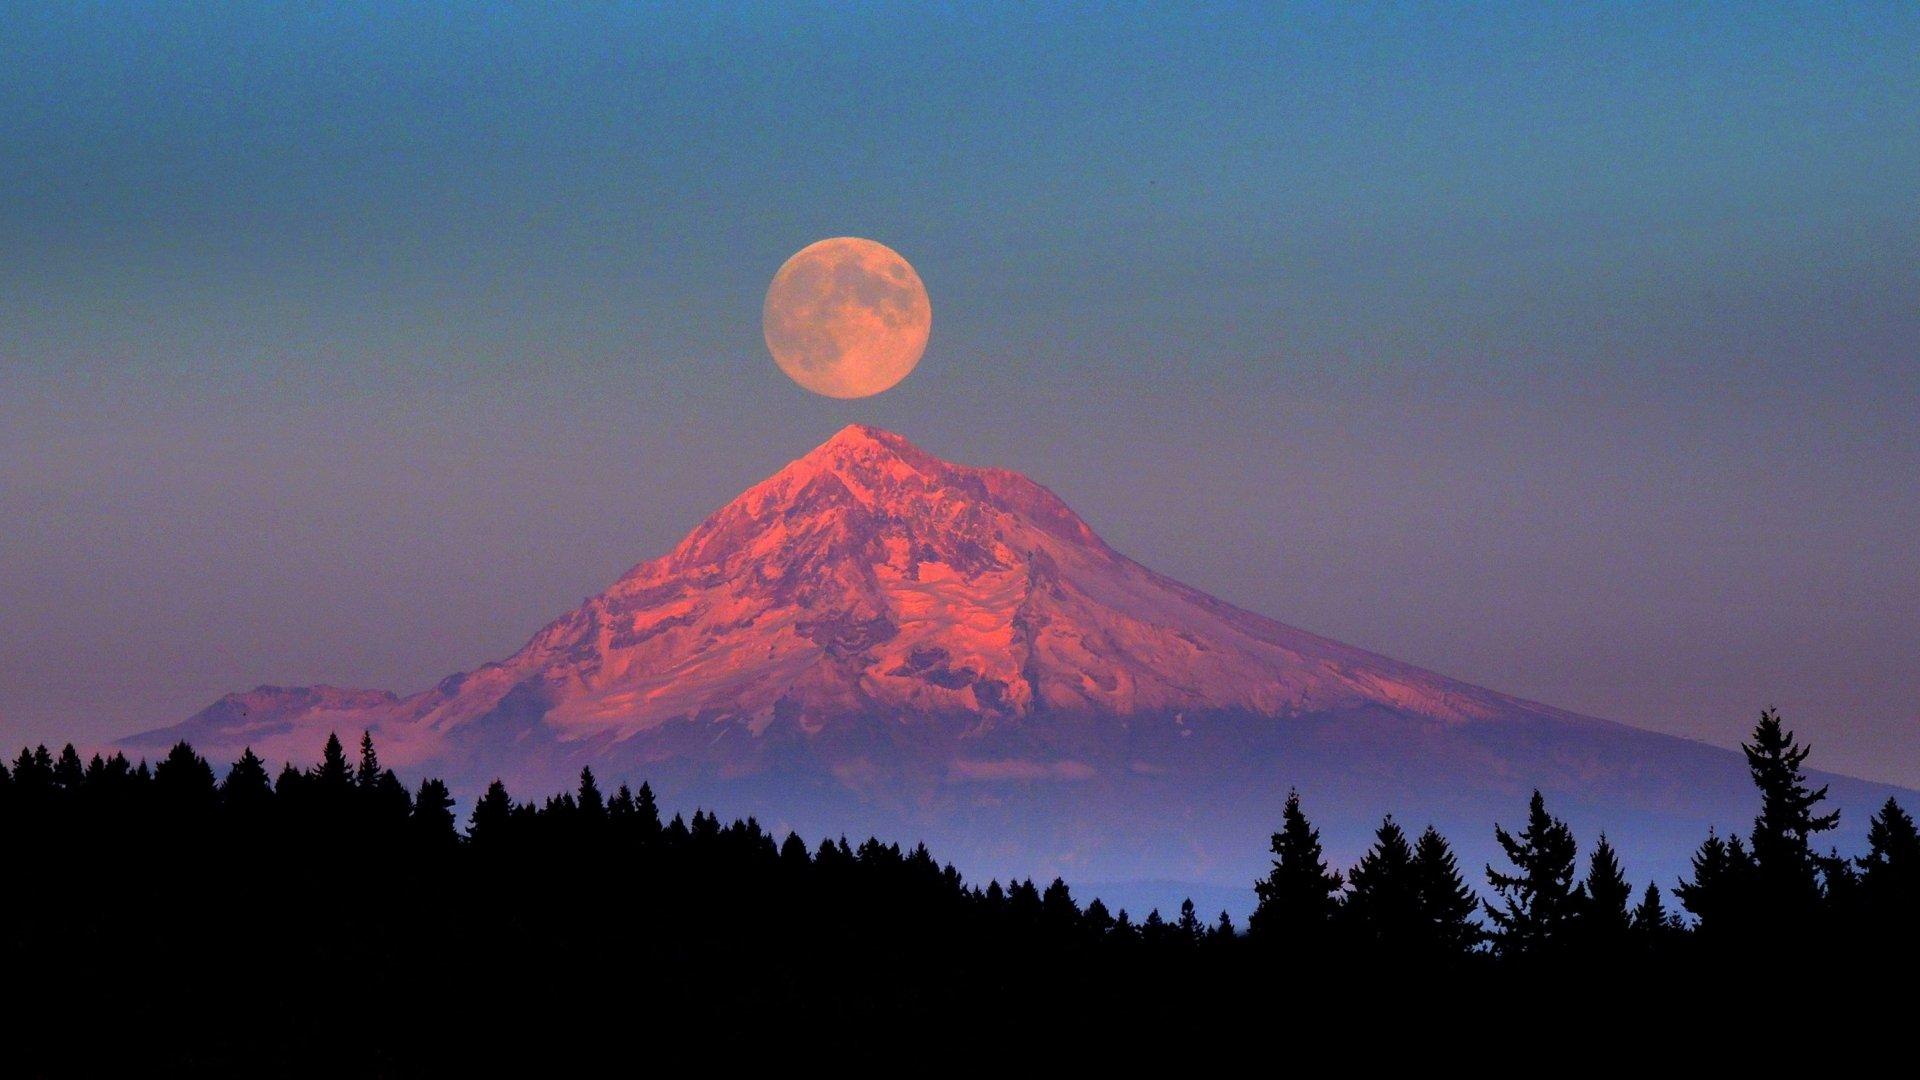 Aesthetic Moon Wallpaper Free Download